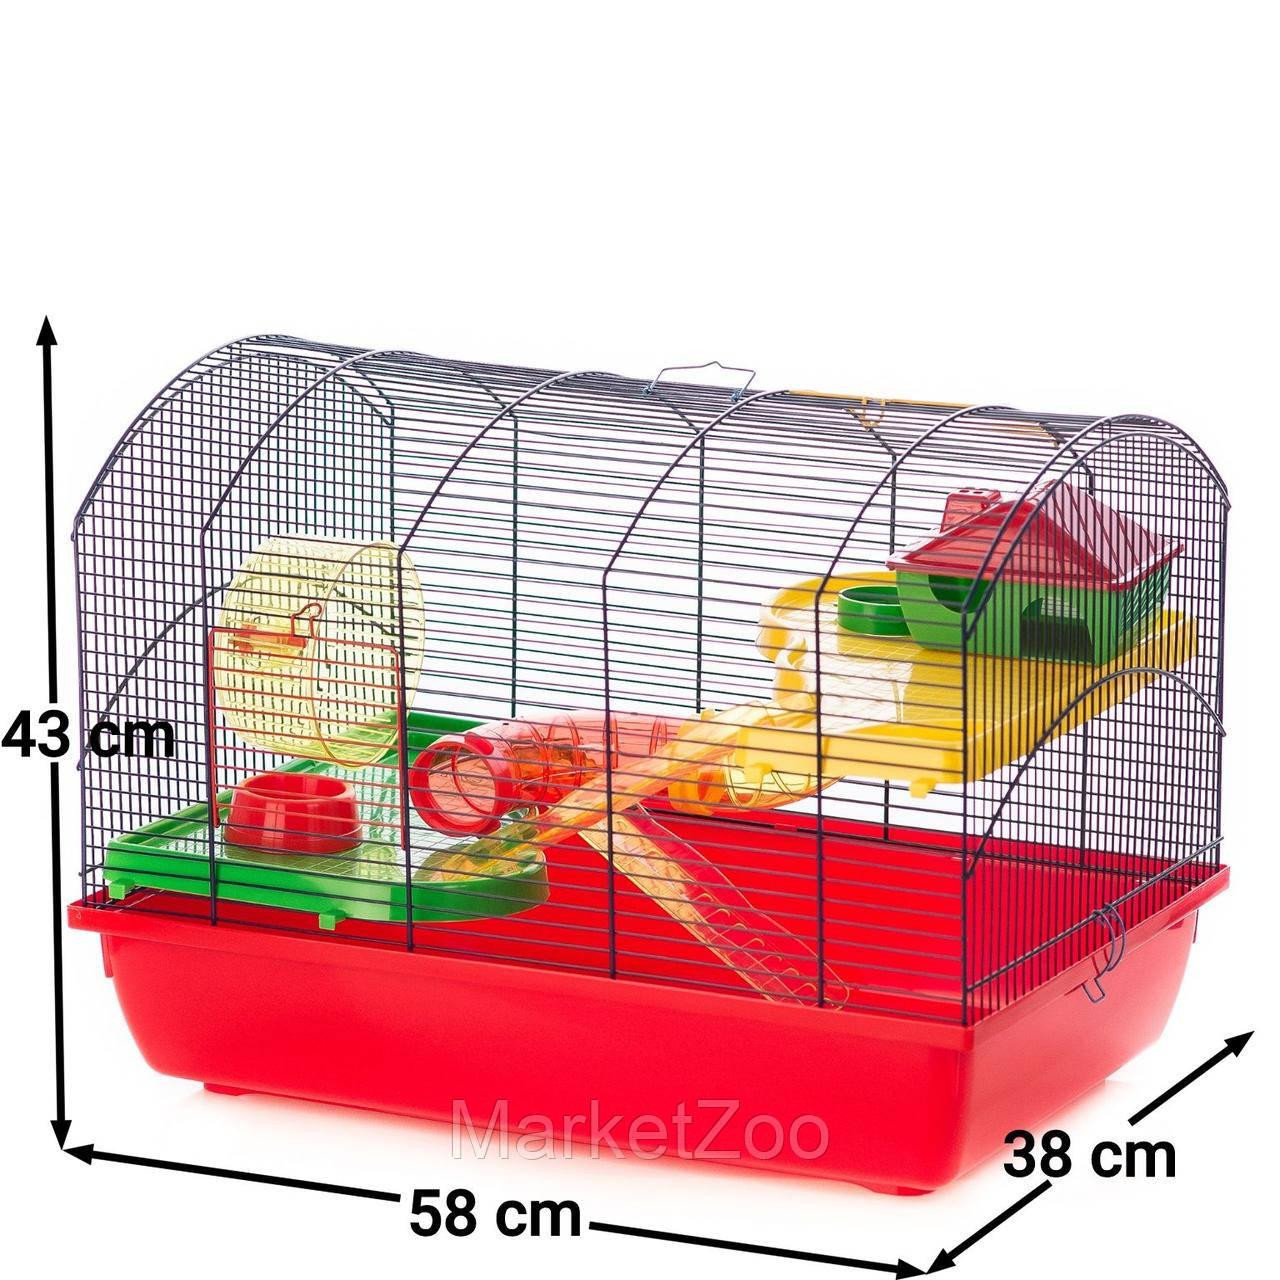 Клетка для грызунов VICTOR III + TUBES Inter Zoo G118 ( 580*380*430 мм)